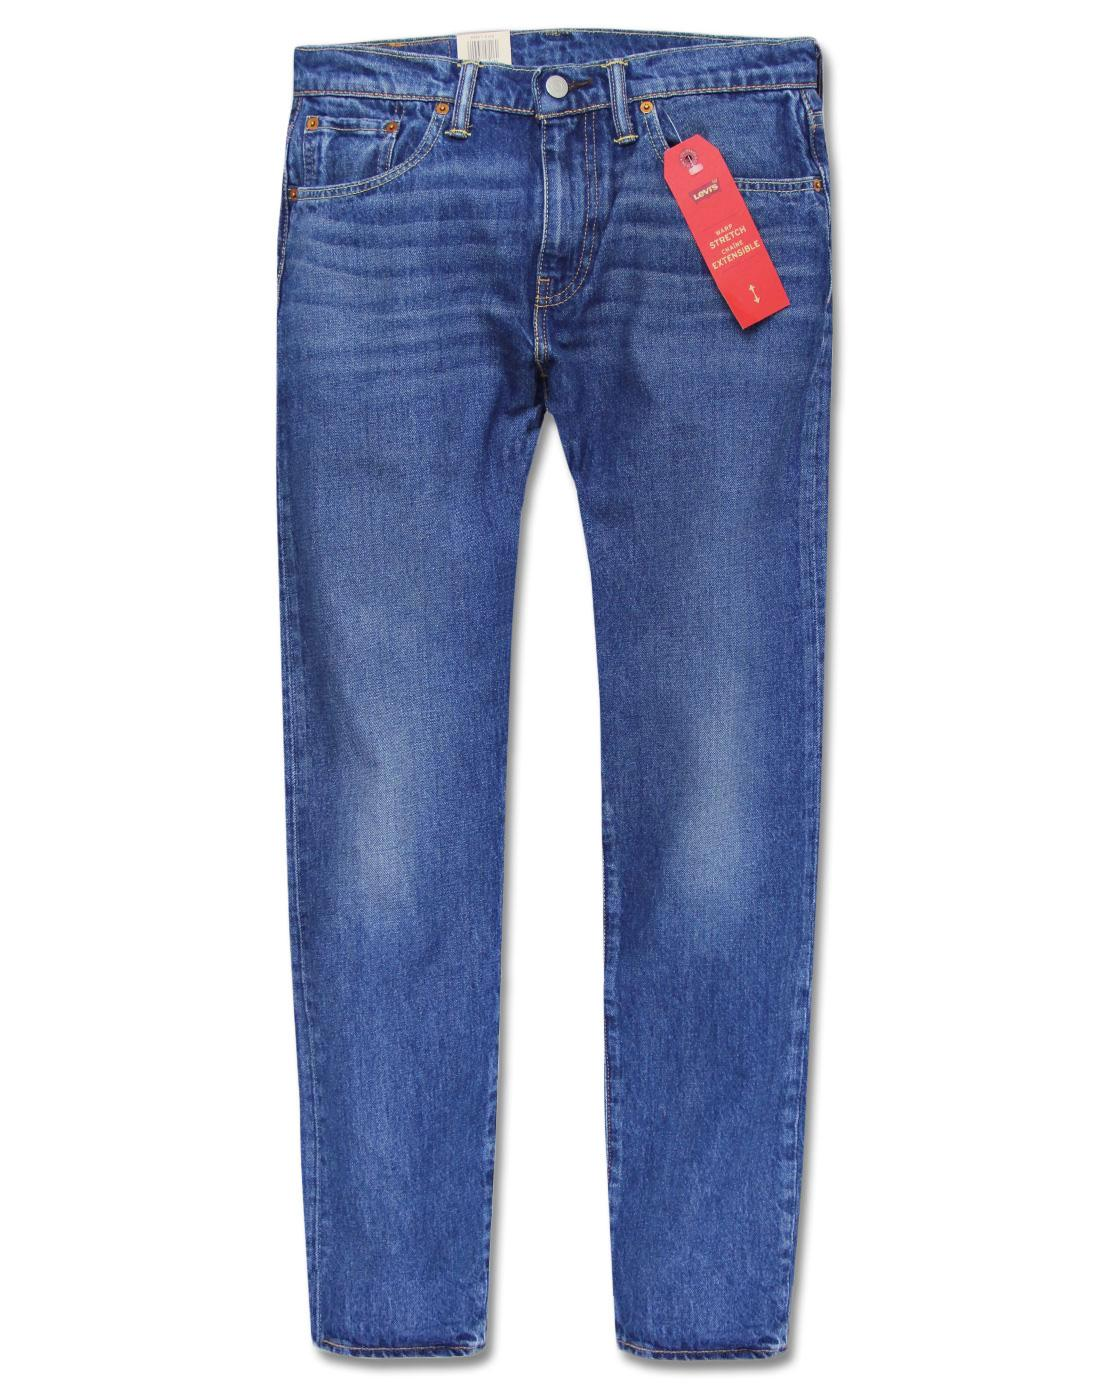 LEVI'S 502 Regular Tapered Denim Jeans MID CITY